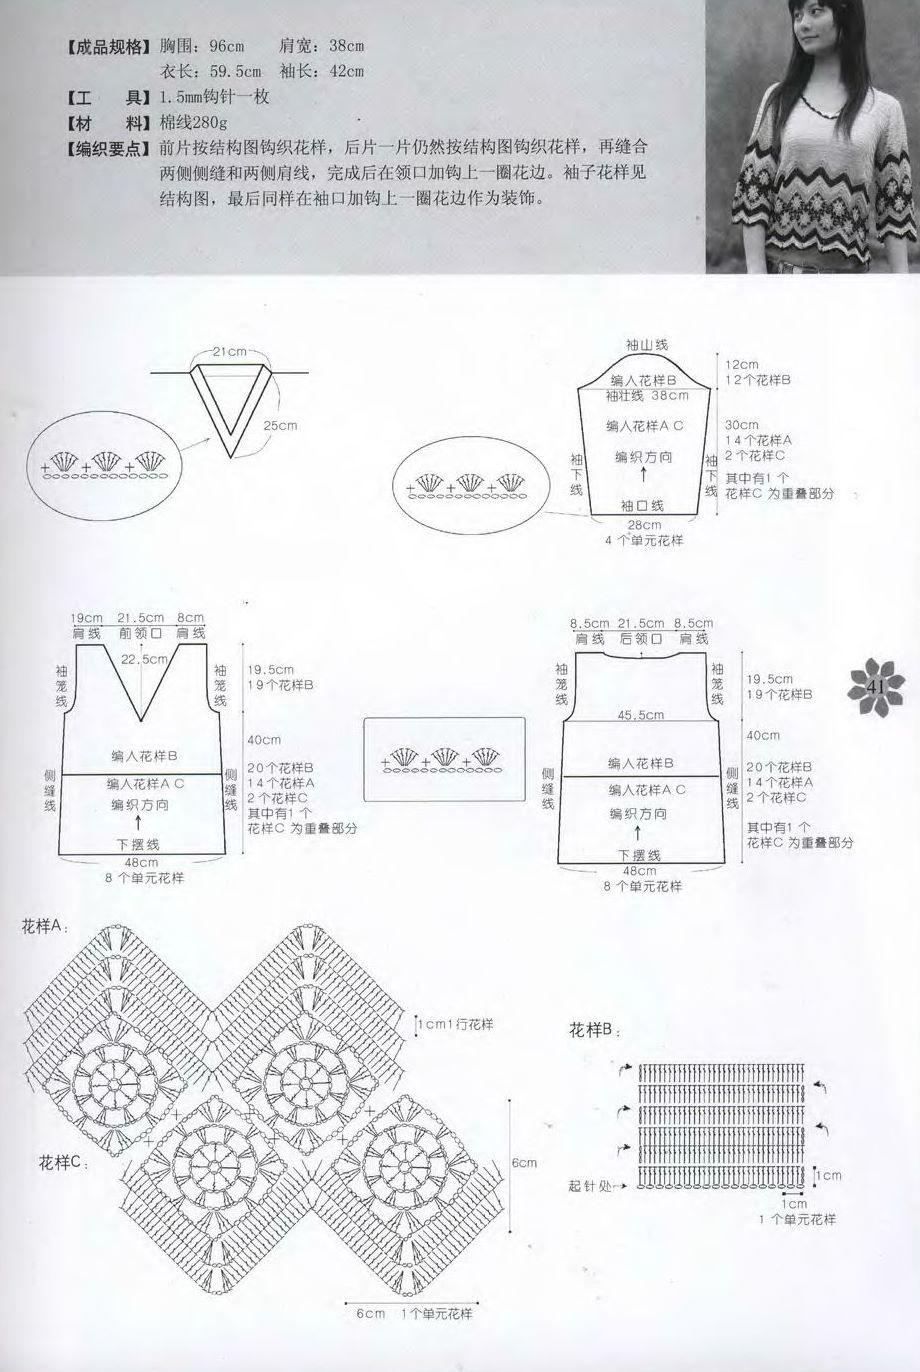 Pin by Lisa Diaz Terriquez on Crochet Tops | Pinterest | Crochet ...